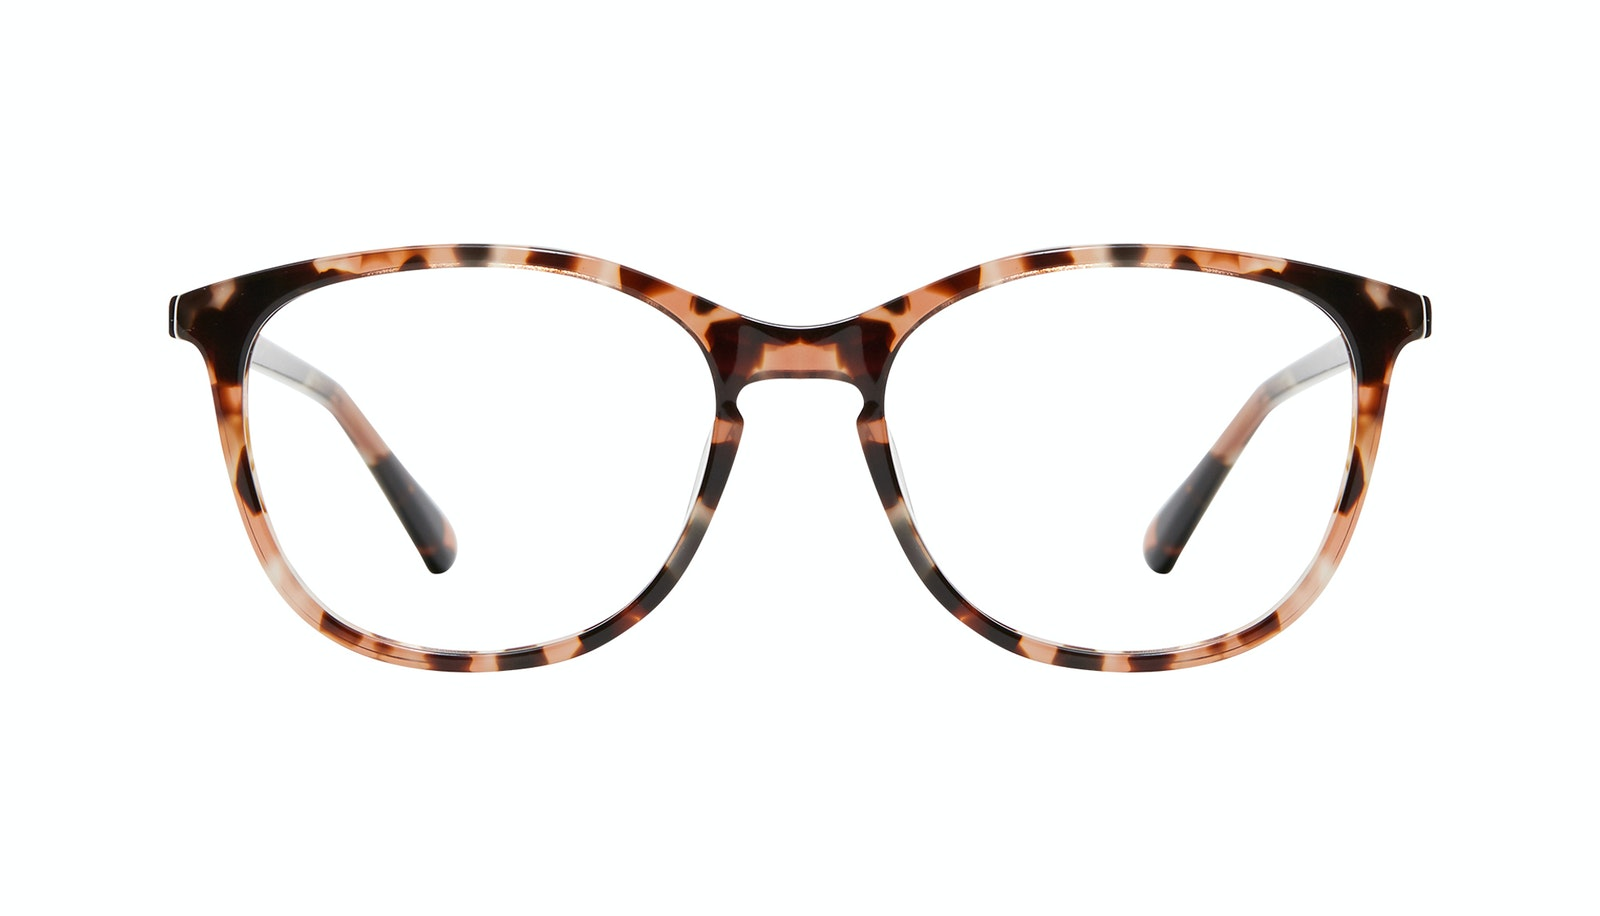 Affordable Fashion Glasses Rectangle Square Round Eyeglasses Women Nadine XL Pink Tortoise